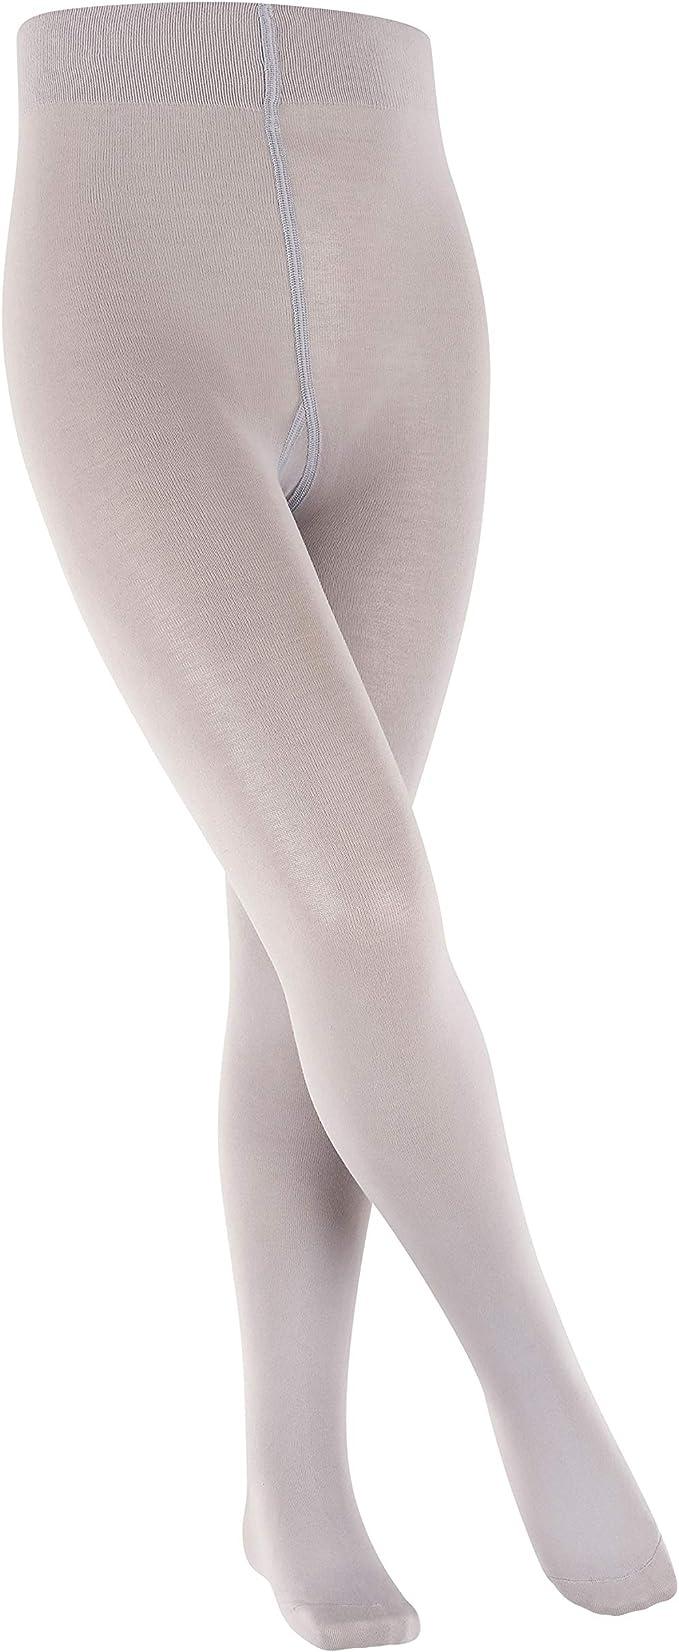 FALKE Casual Basics Kinder Strumpfhose Cotton-Touch 2er Pack